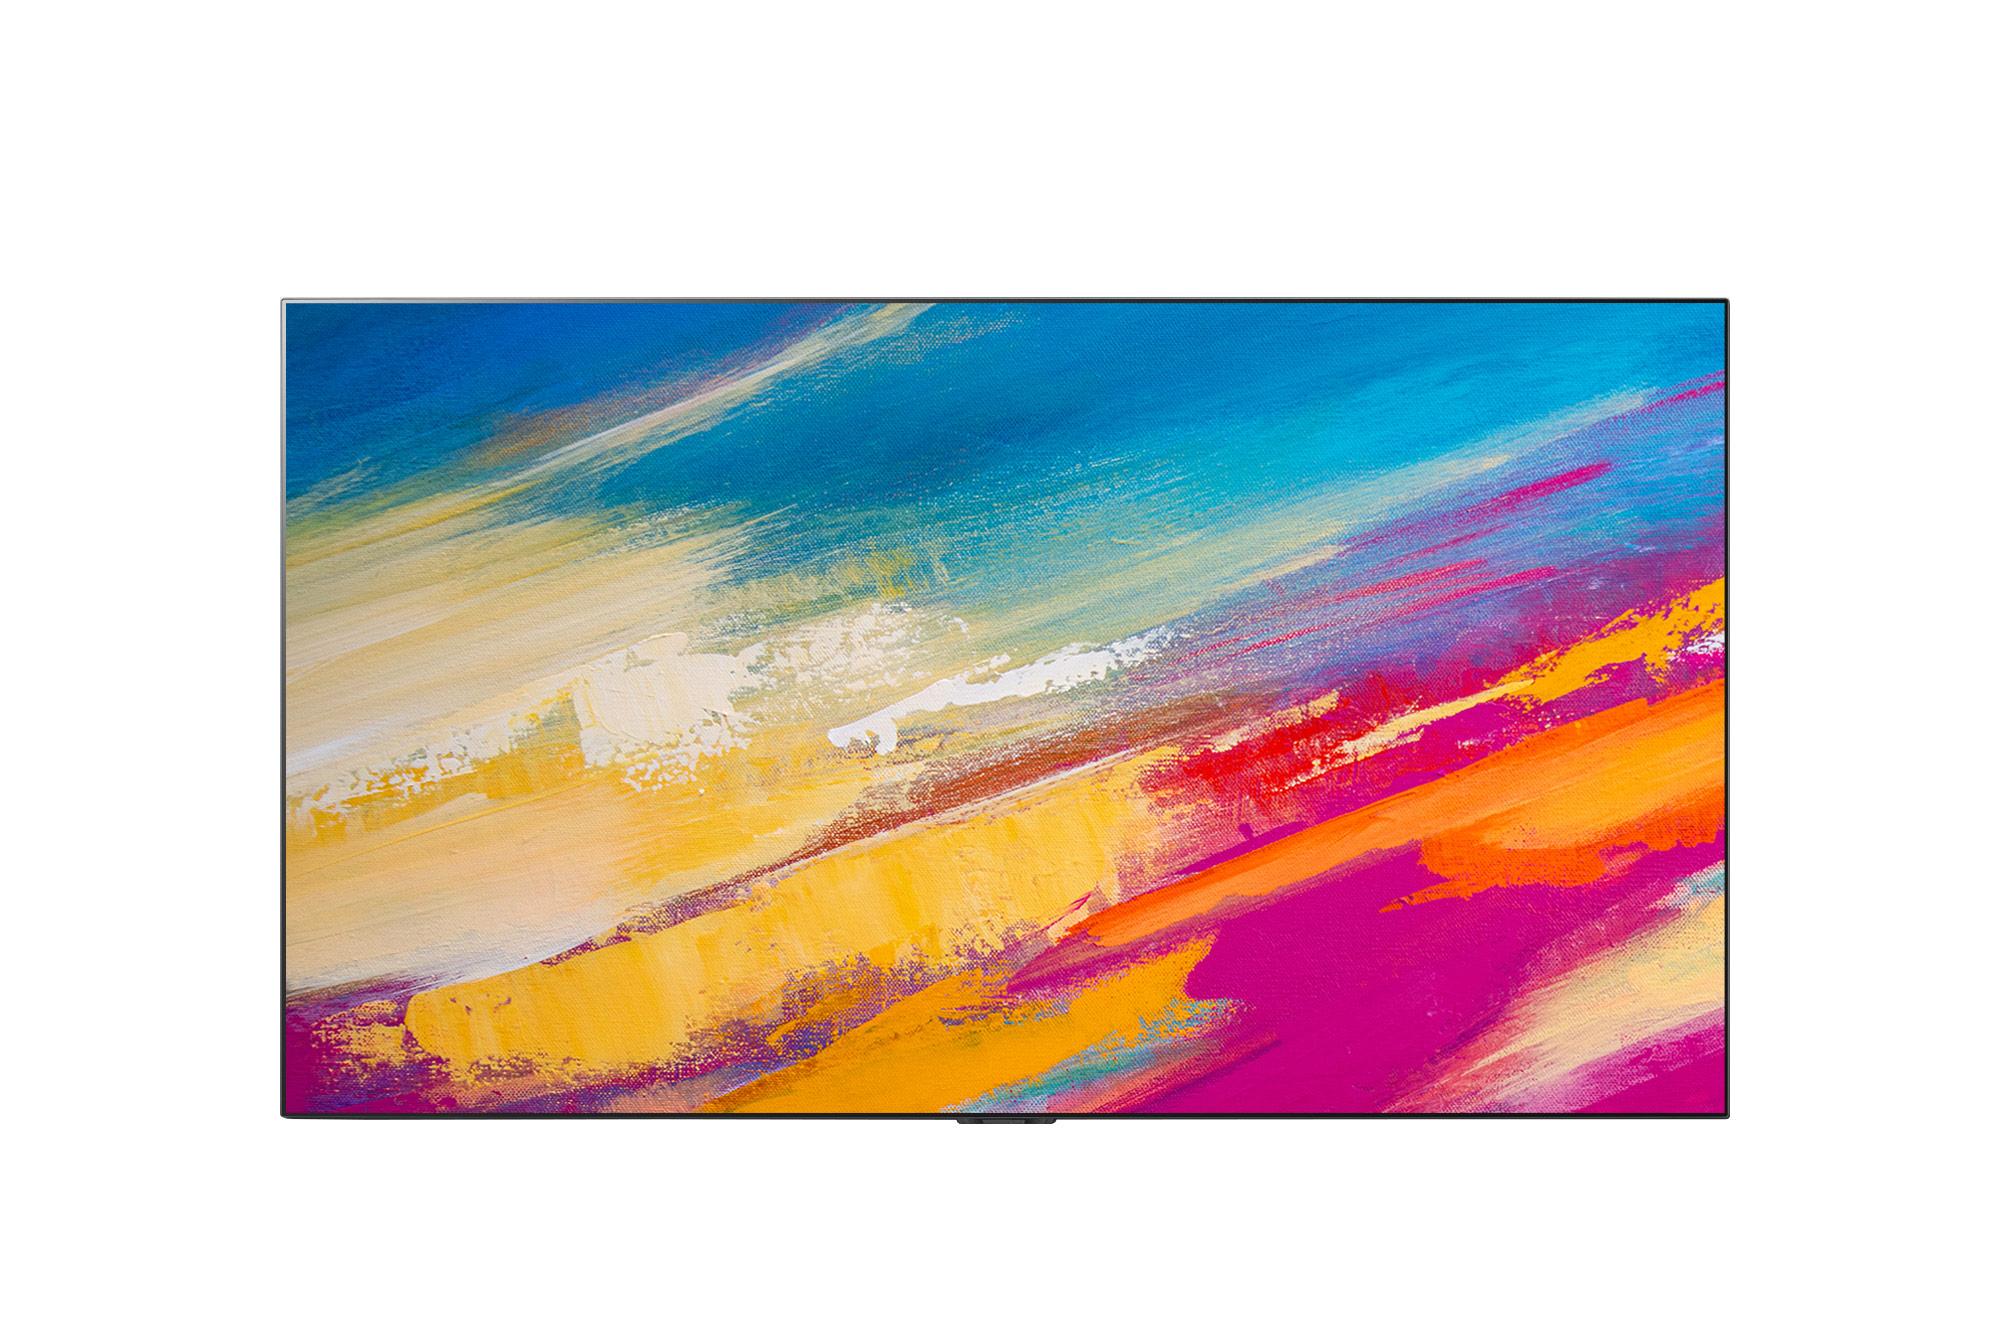 LG Pro:Centric SMART 65WS960H (EU)